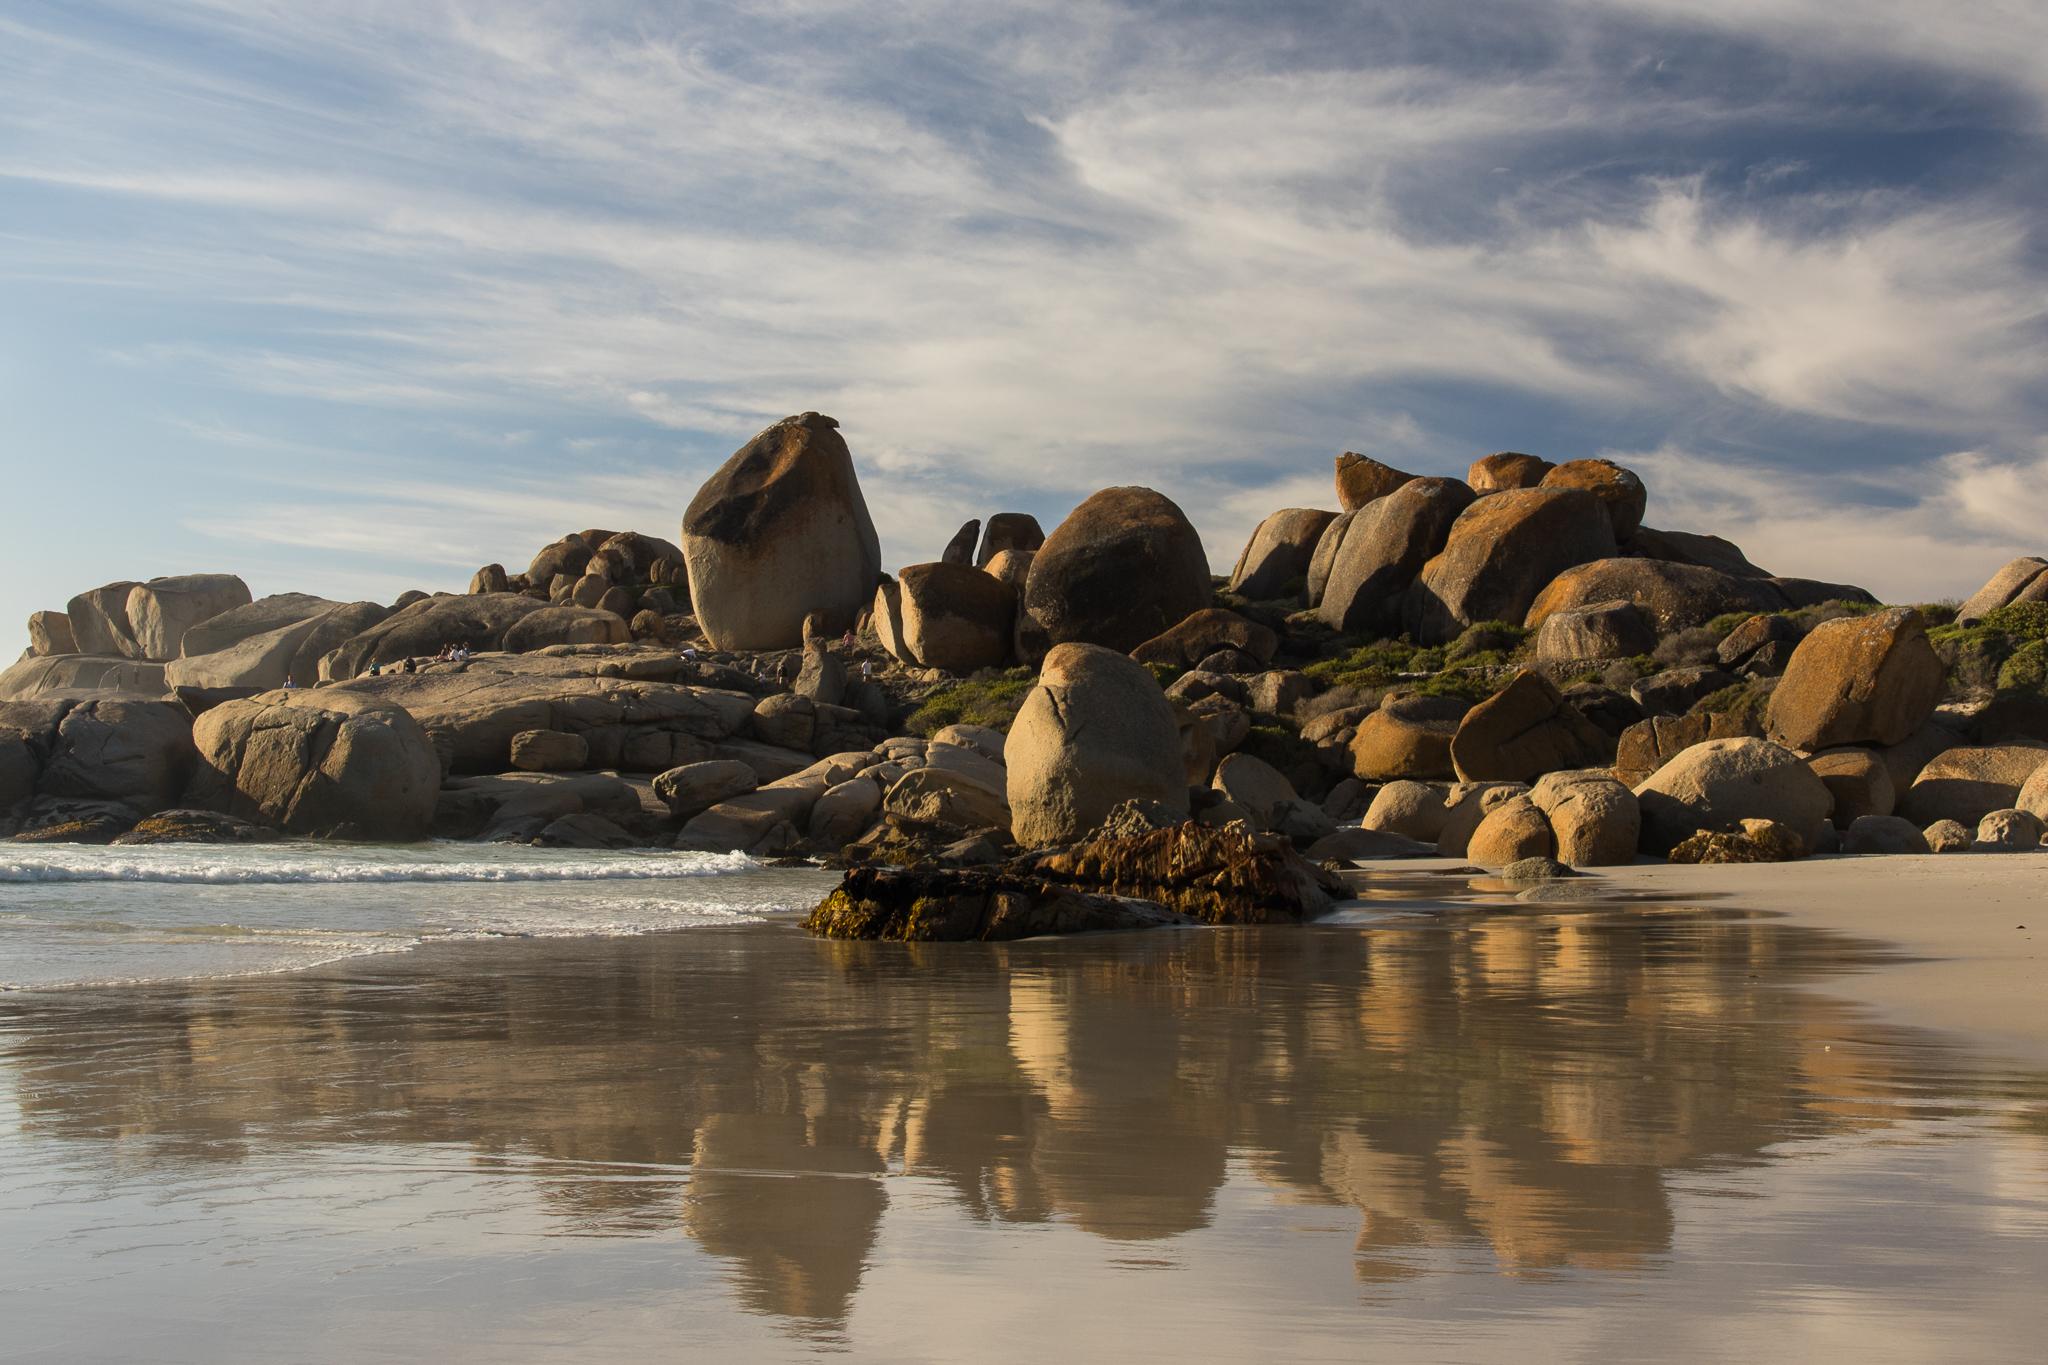 capetown_beach_boulders-1.JPG